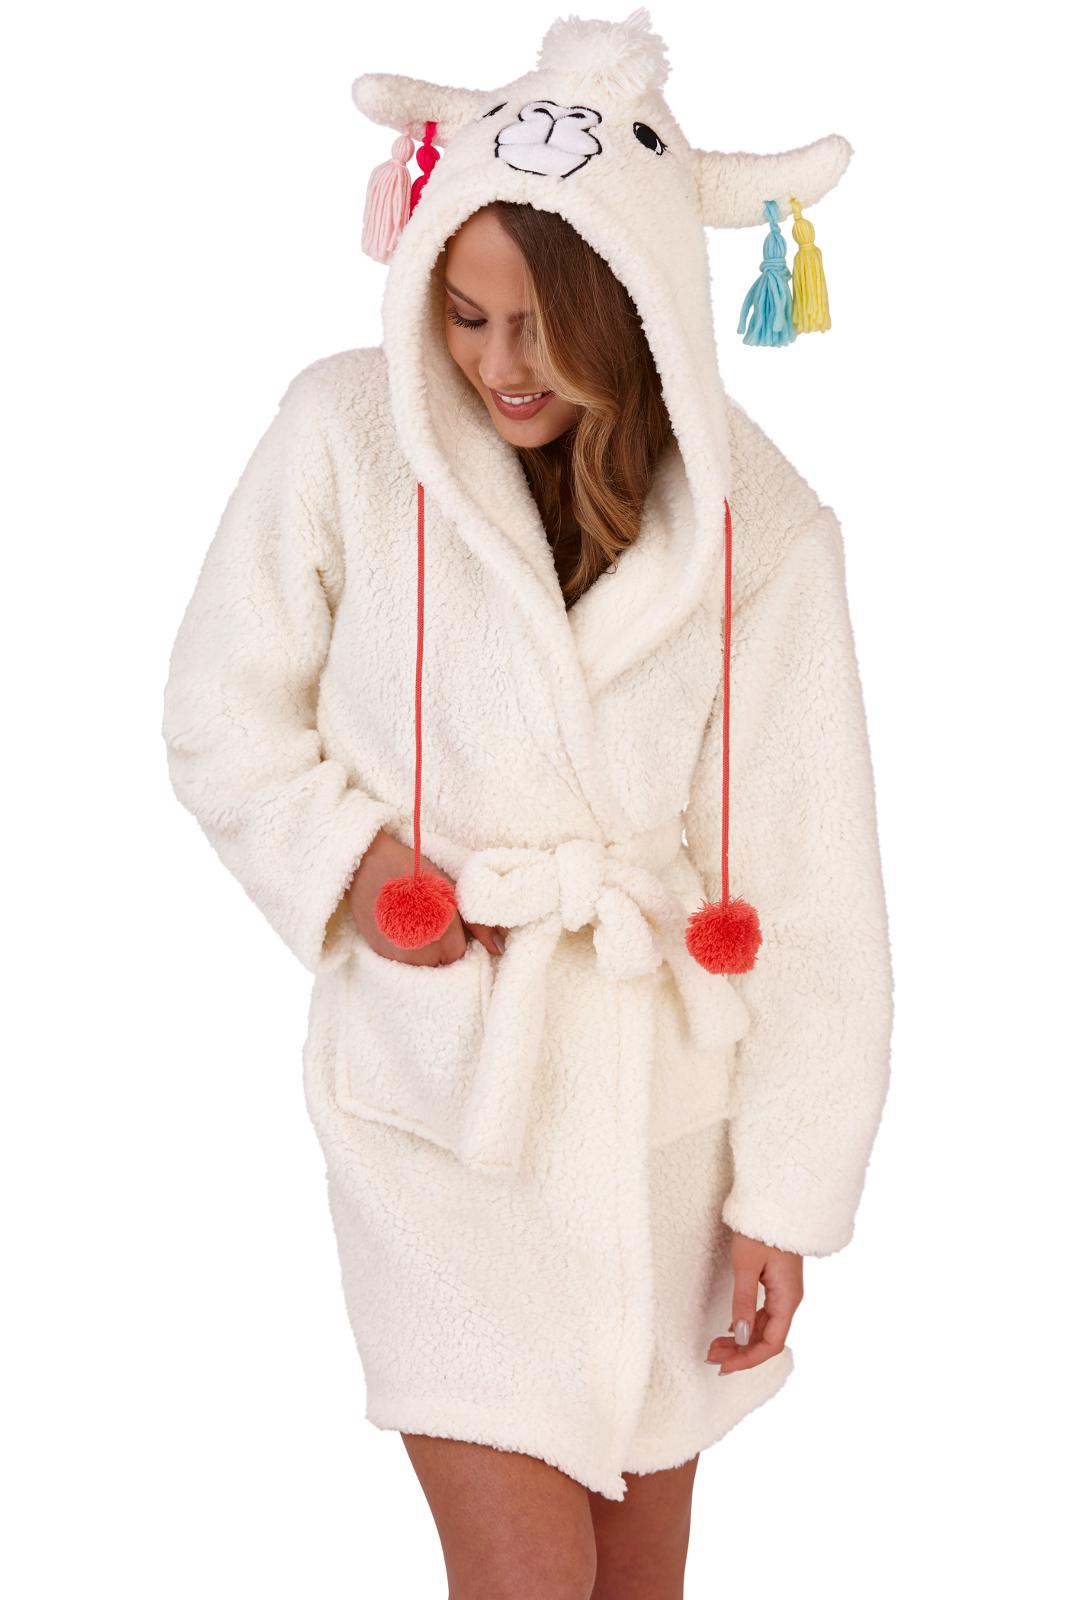 11e819dd69 Womens Llama Dressing Gown 3D Character Luxury Hooded Fleece Bath Robe  Housecoat